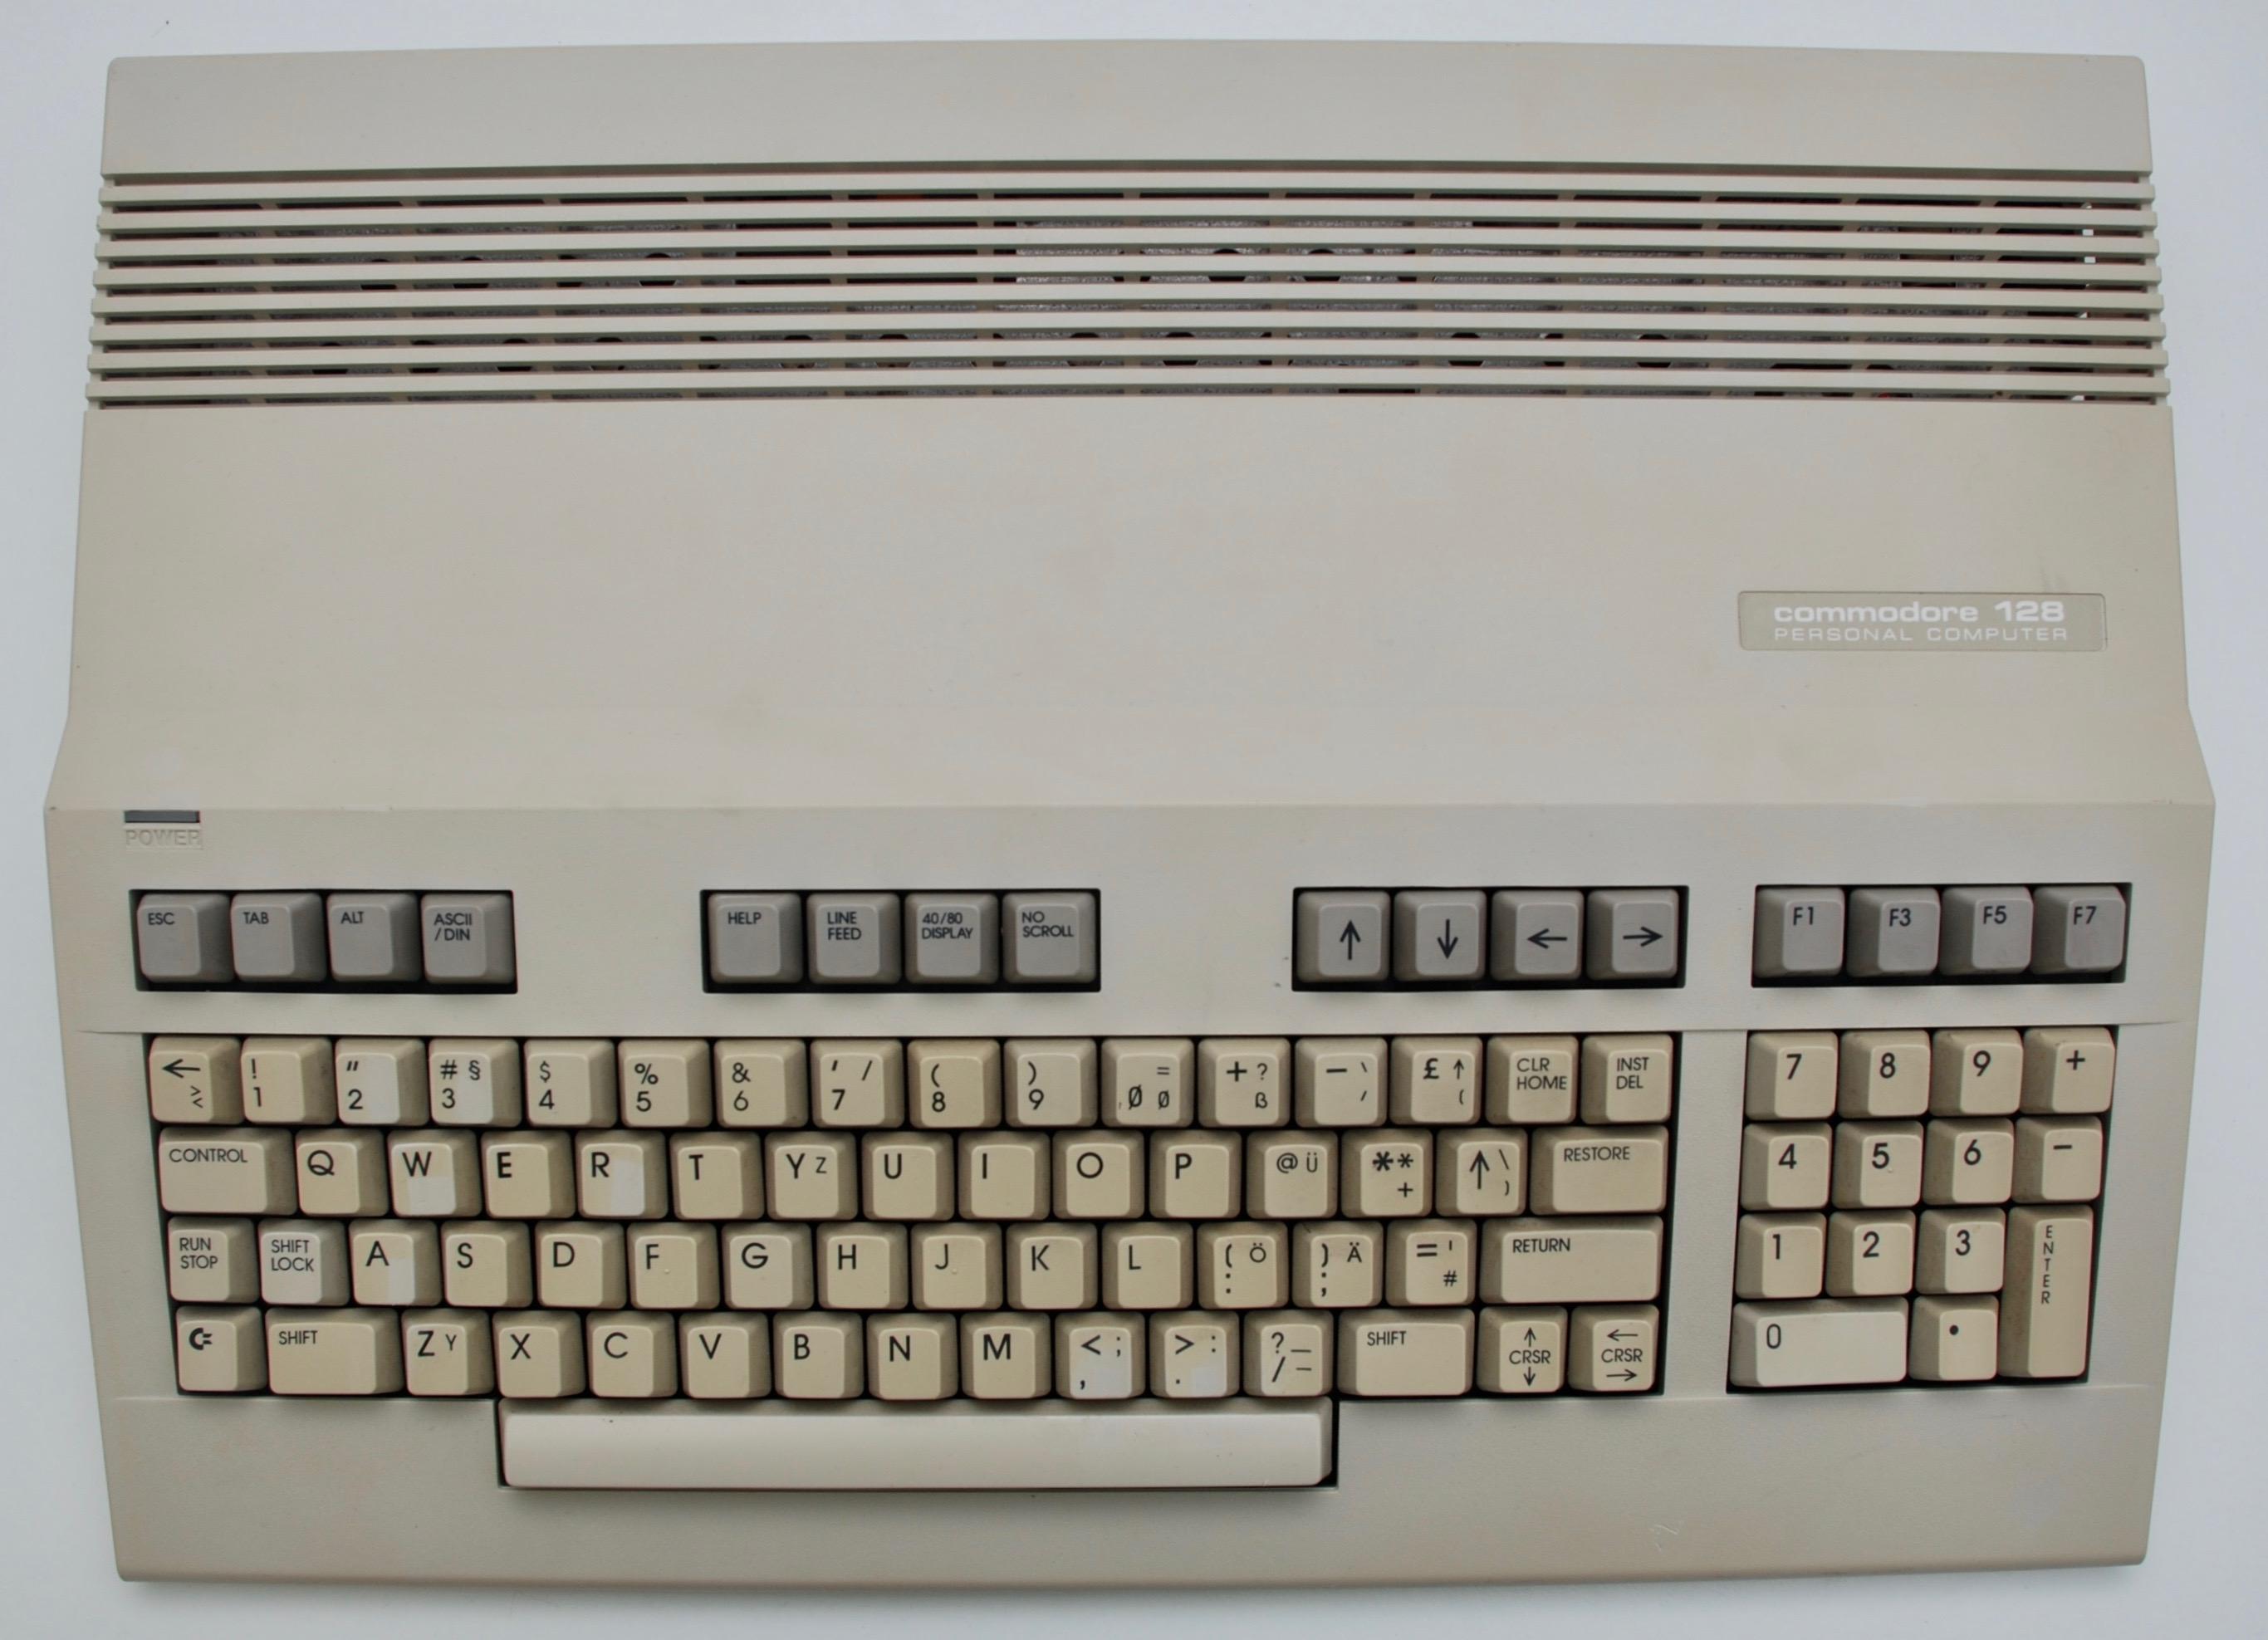 Commodore C128 – Old Crap Vintage Computing